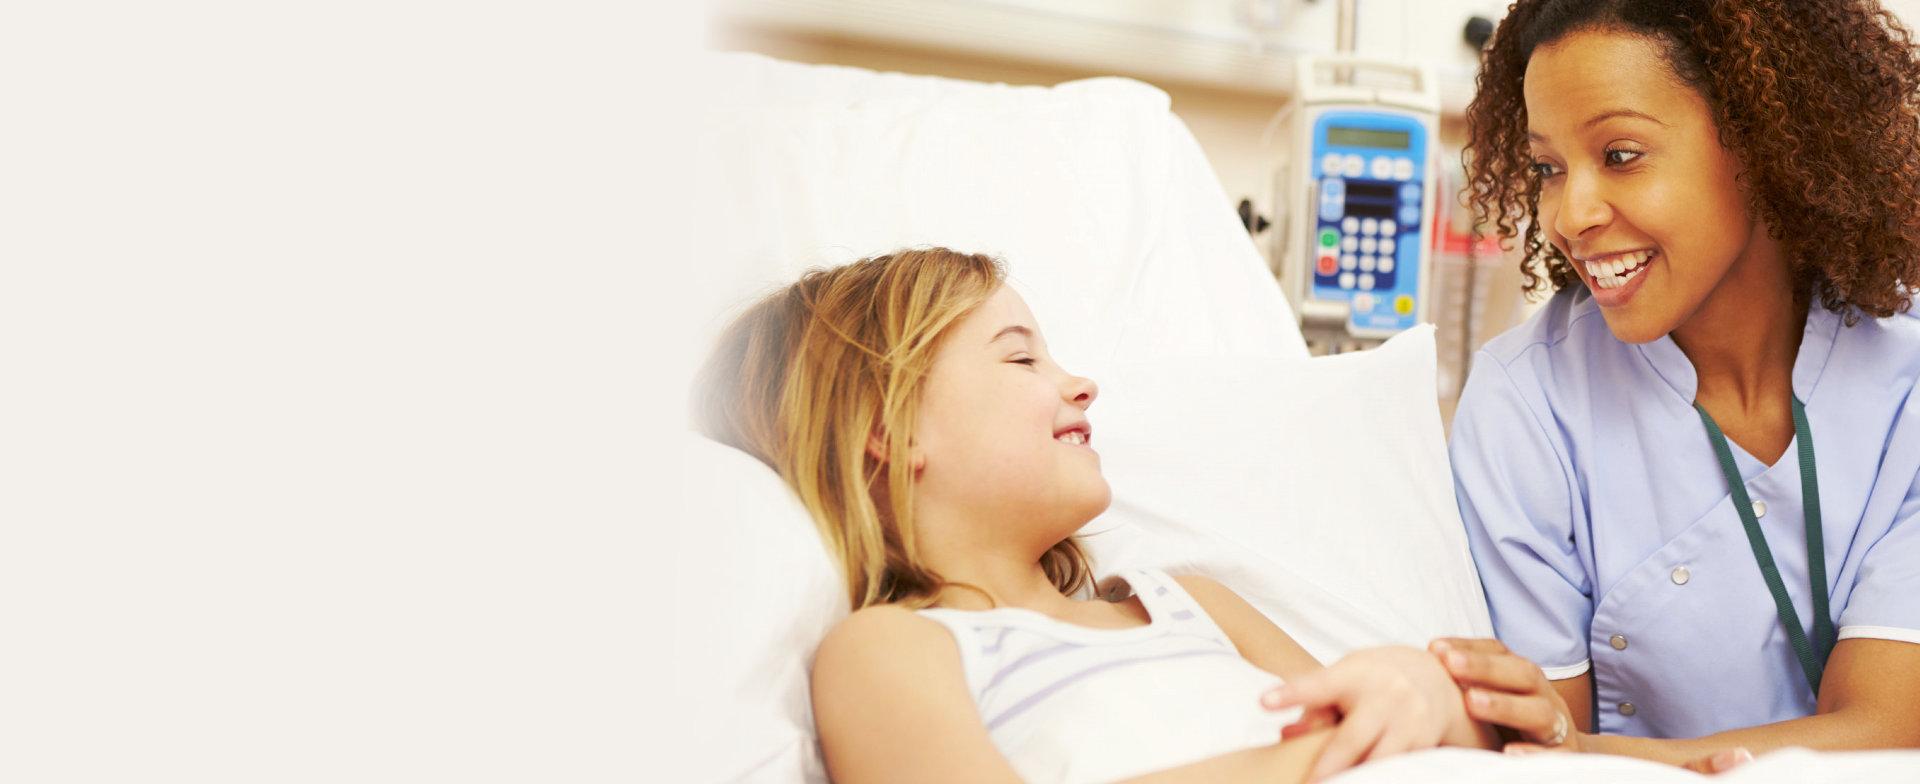 caregiver and little girl havin a fun conversation